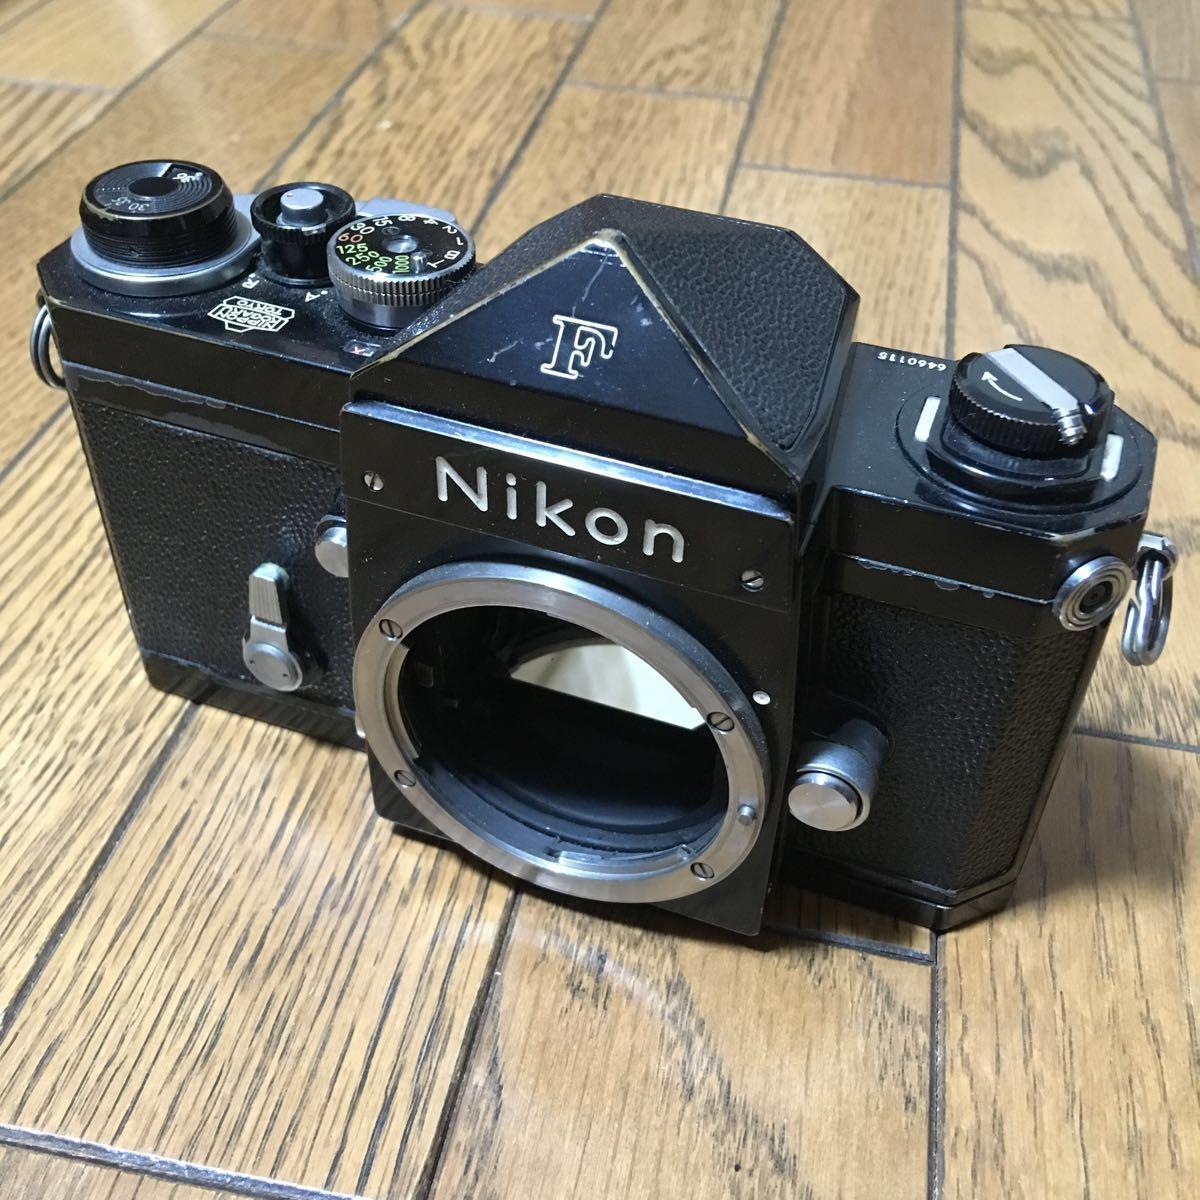 Nikon F アイレベル ブラック ボディ 646万台 前期型 動作確認済みです。_画像2